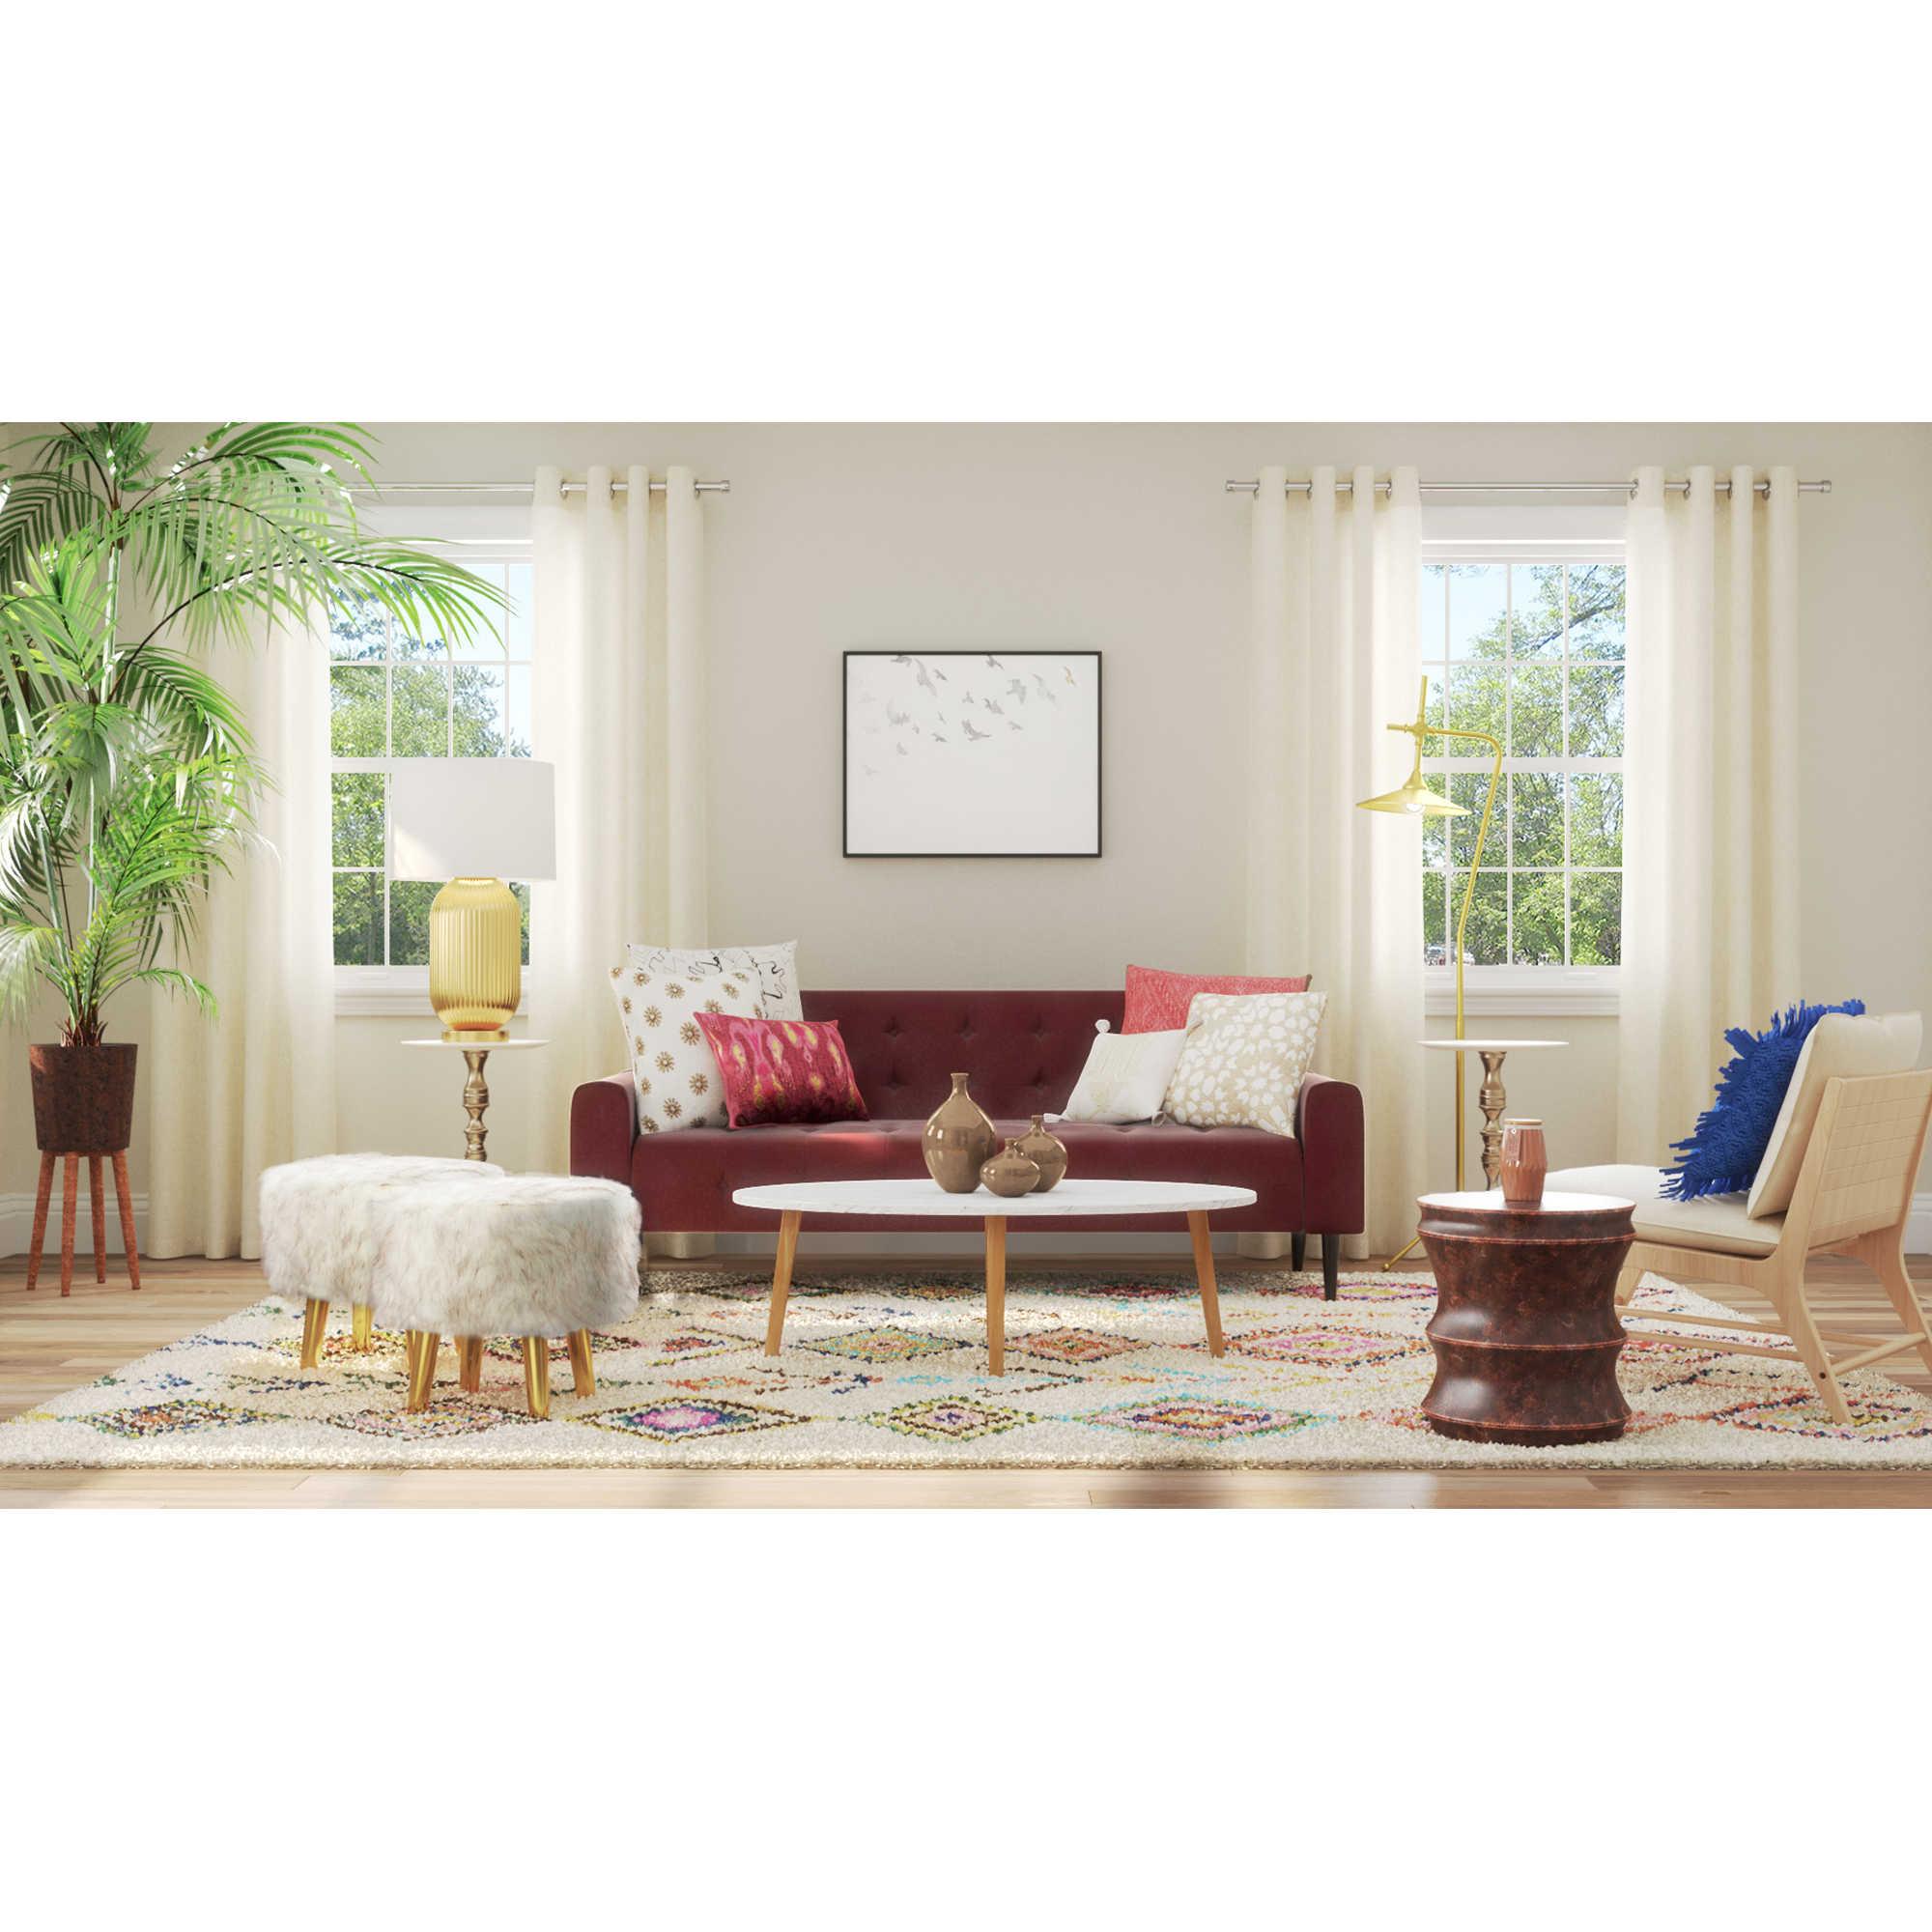 Sophisticated Patterns Living Room - Bed Bath & Beyond